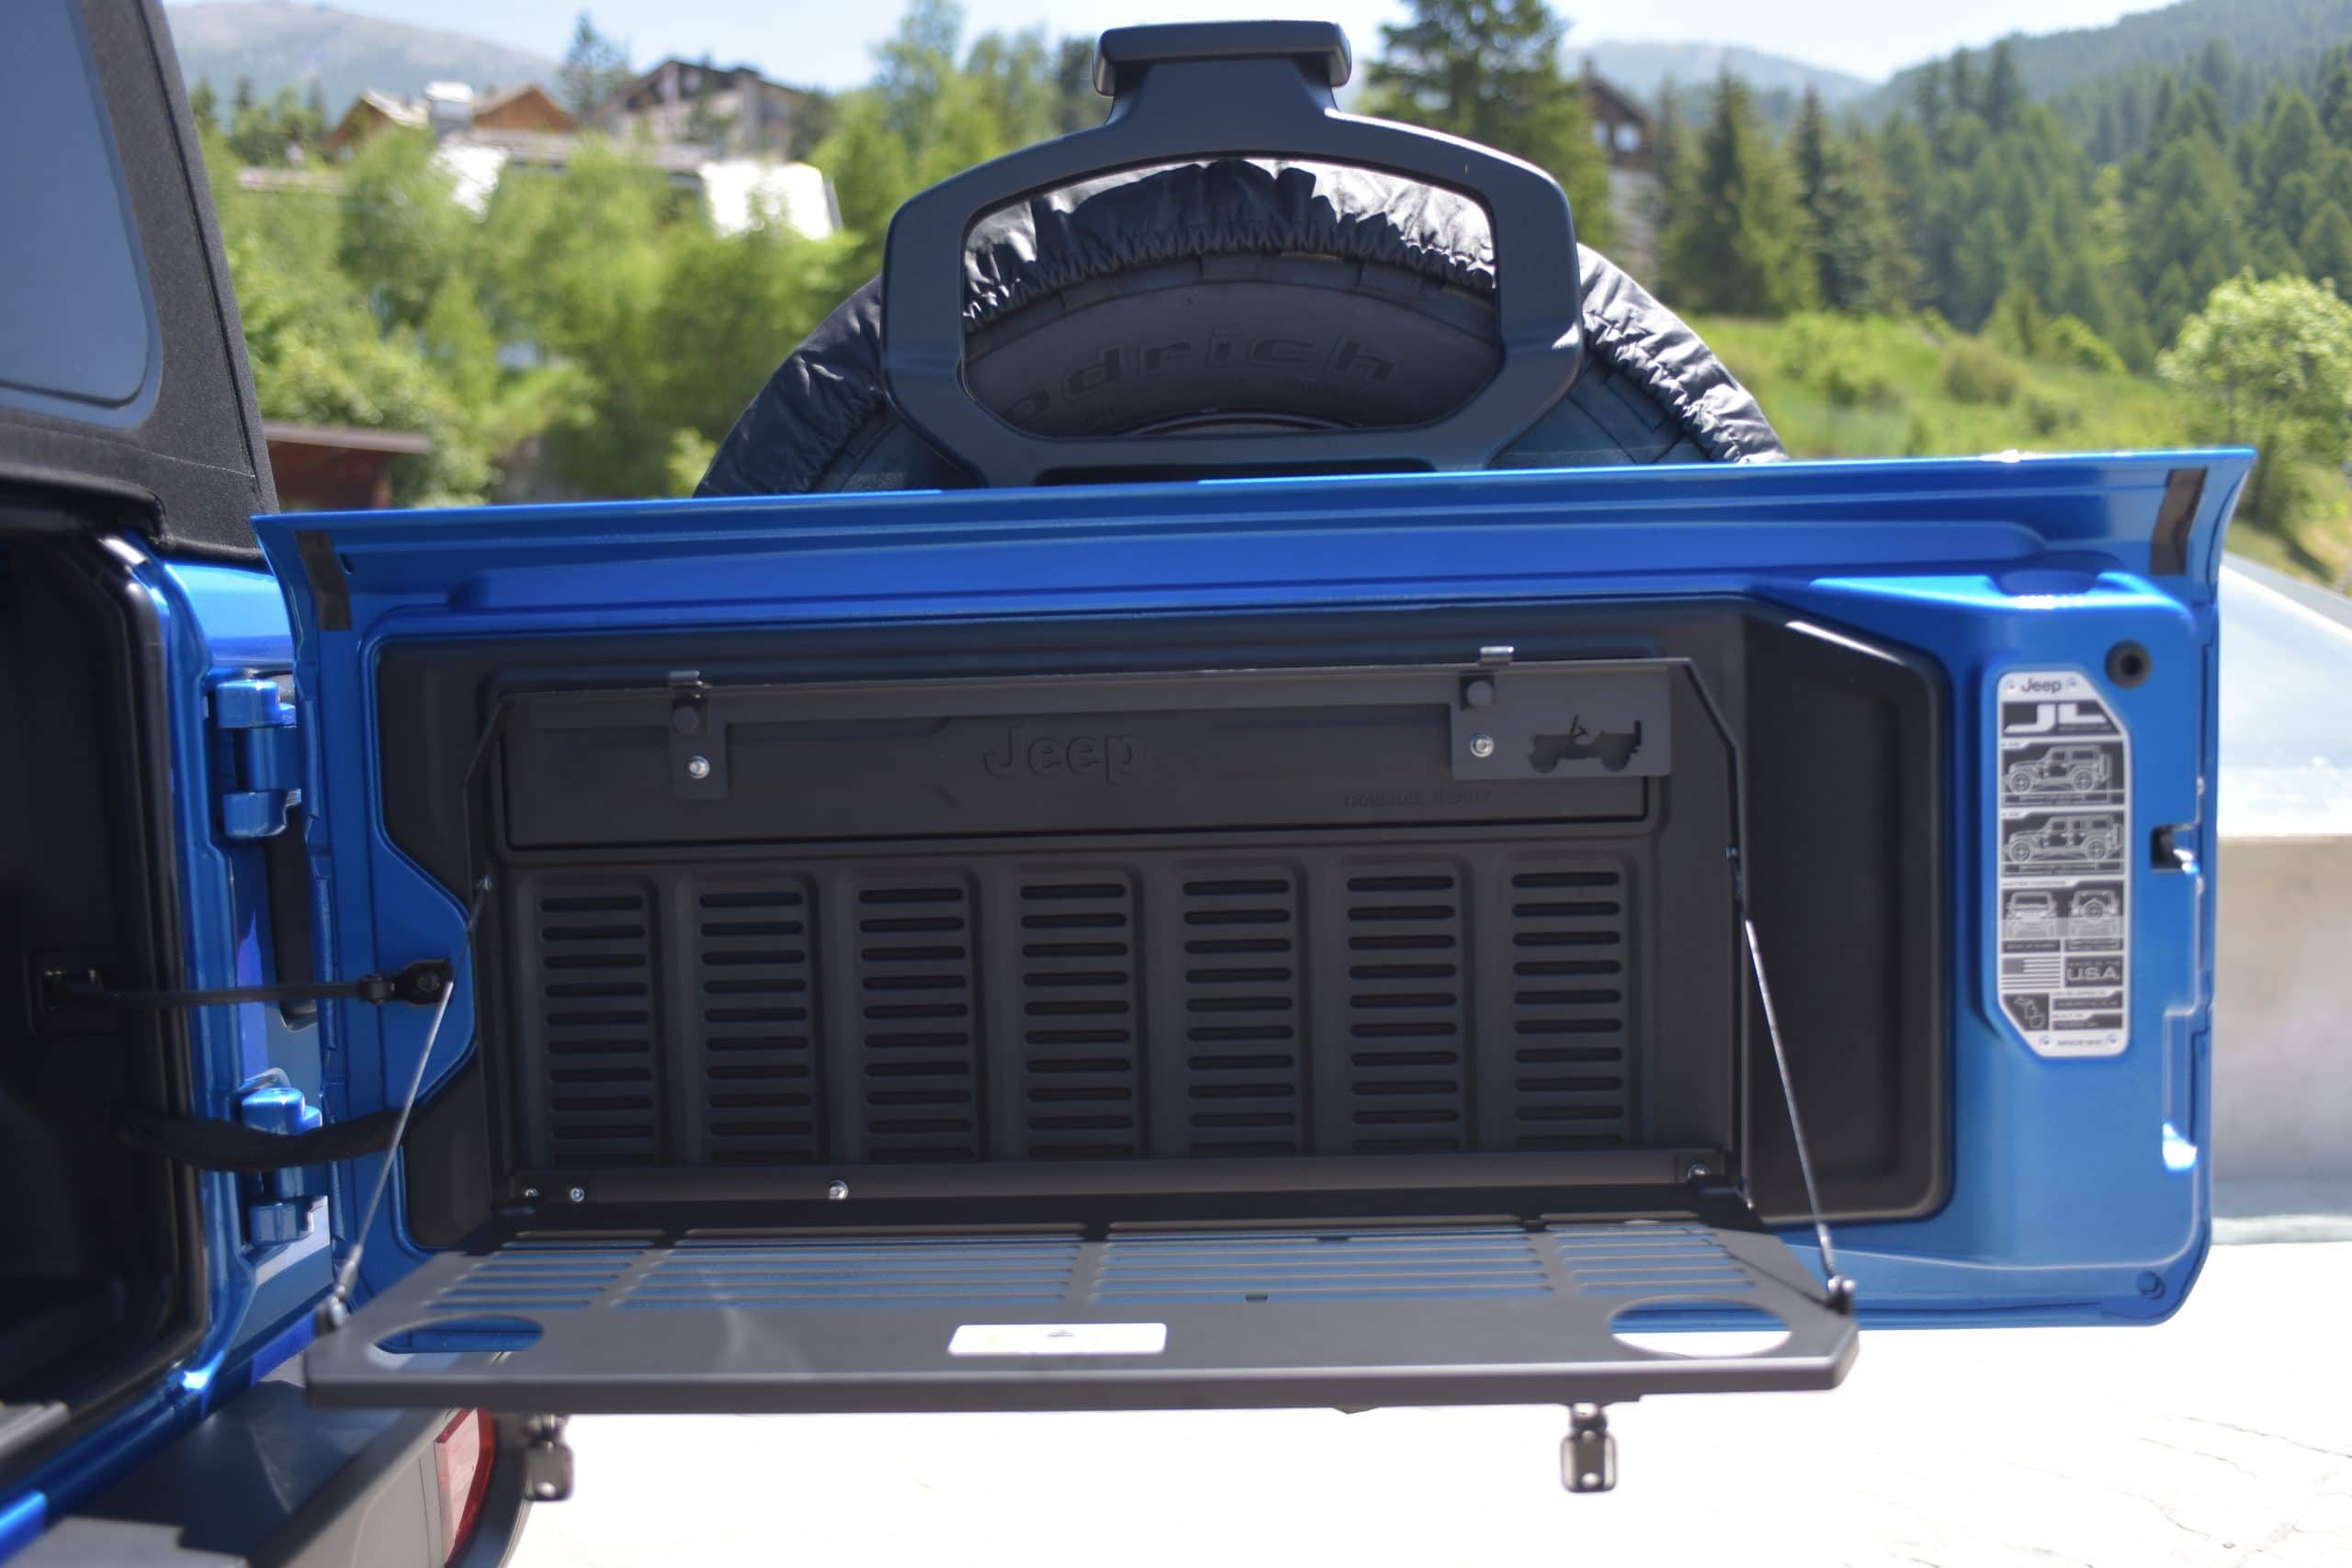 05 Jeep Wrangler 4xe scaled Νέα σειρά αξεσουάρ για το Plug-in Hybrid, Jeep Wrangler 4xe Jeep, Jeep 4XE, Mopar, Wrangler, Wrangler 4XE, ειδήσεις, Νέα